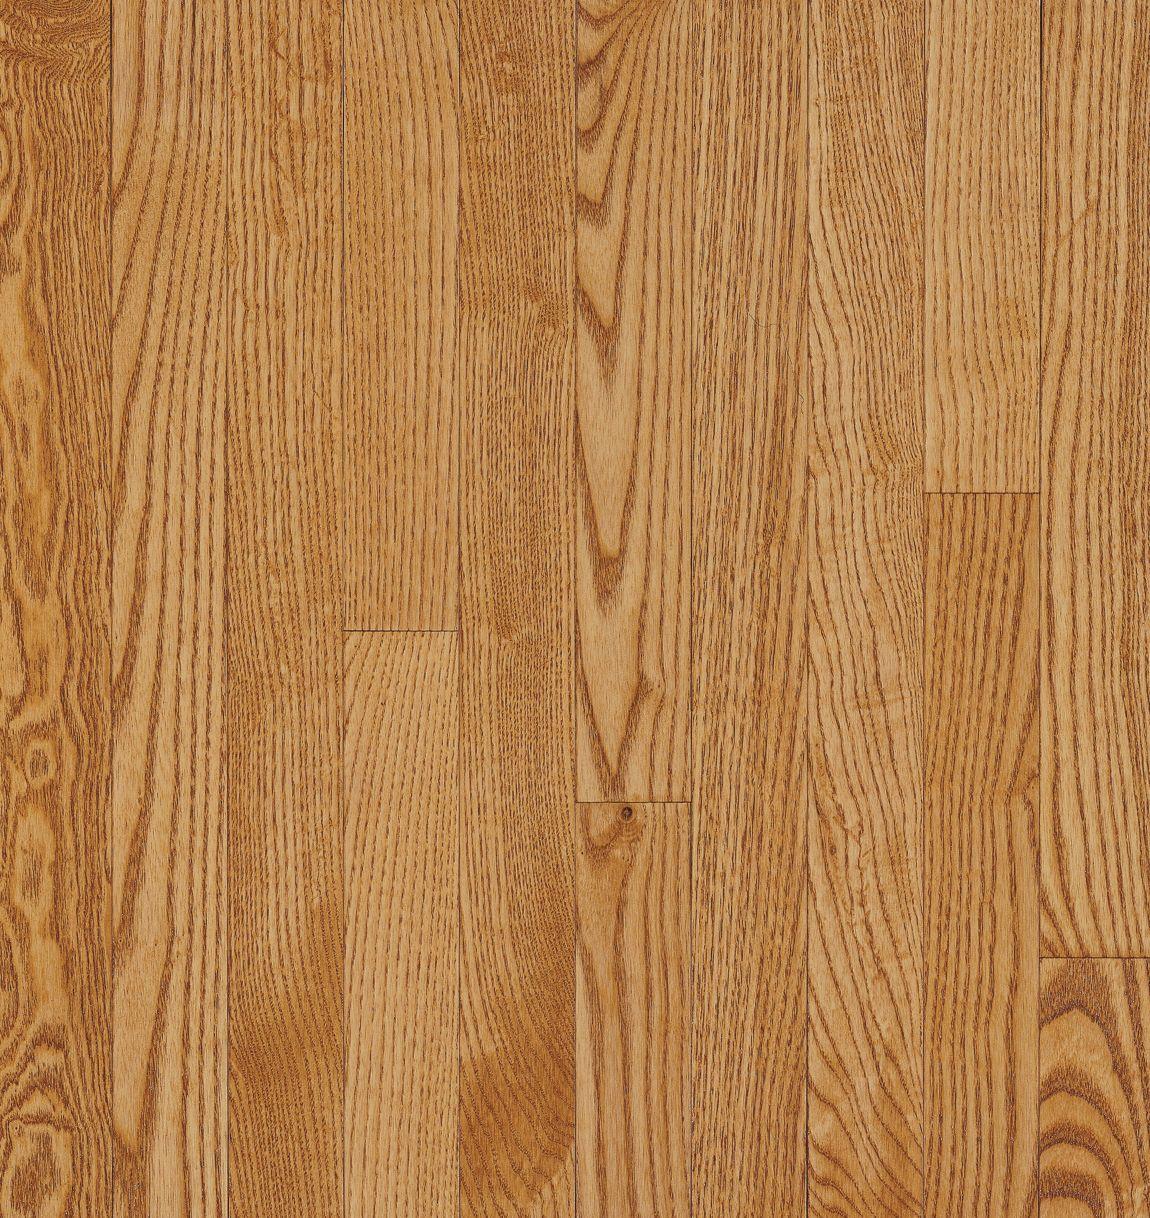 Oak Hardwood Flooring Tan Cb9232 By Bruce Discontinued